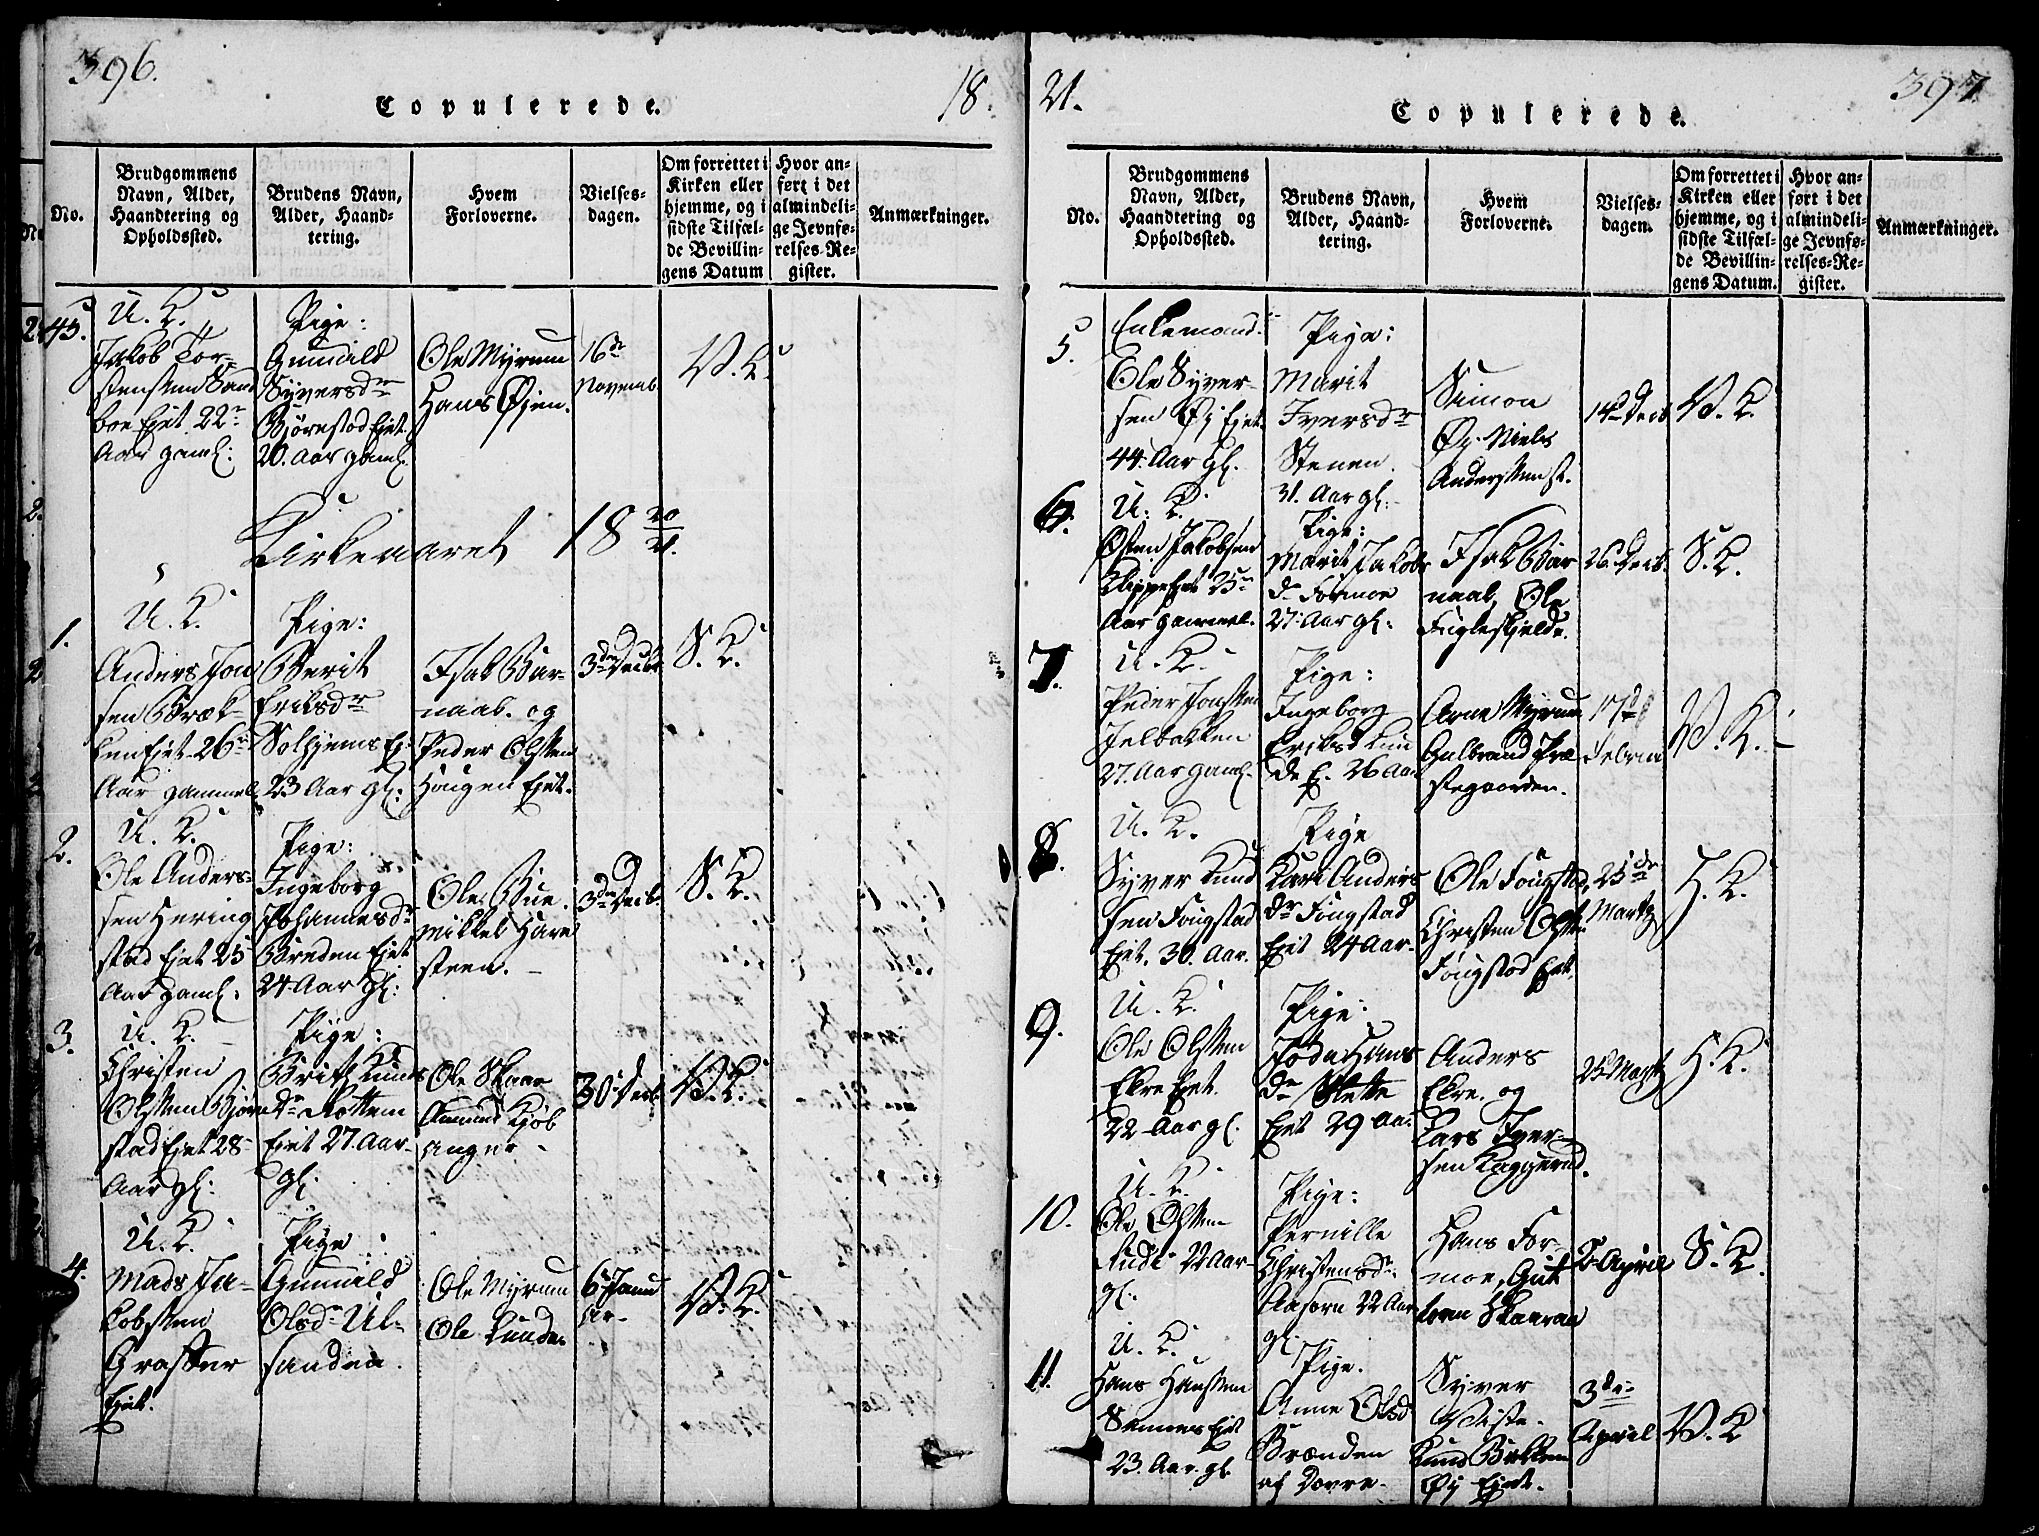 SAH, Vågå prestekontor, Ministerialbok nr. 3, 1815-1827, s. 396-397